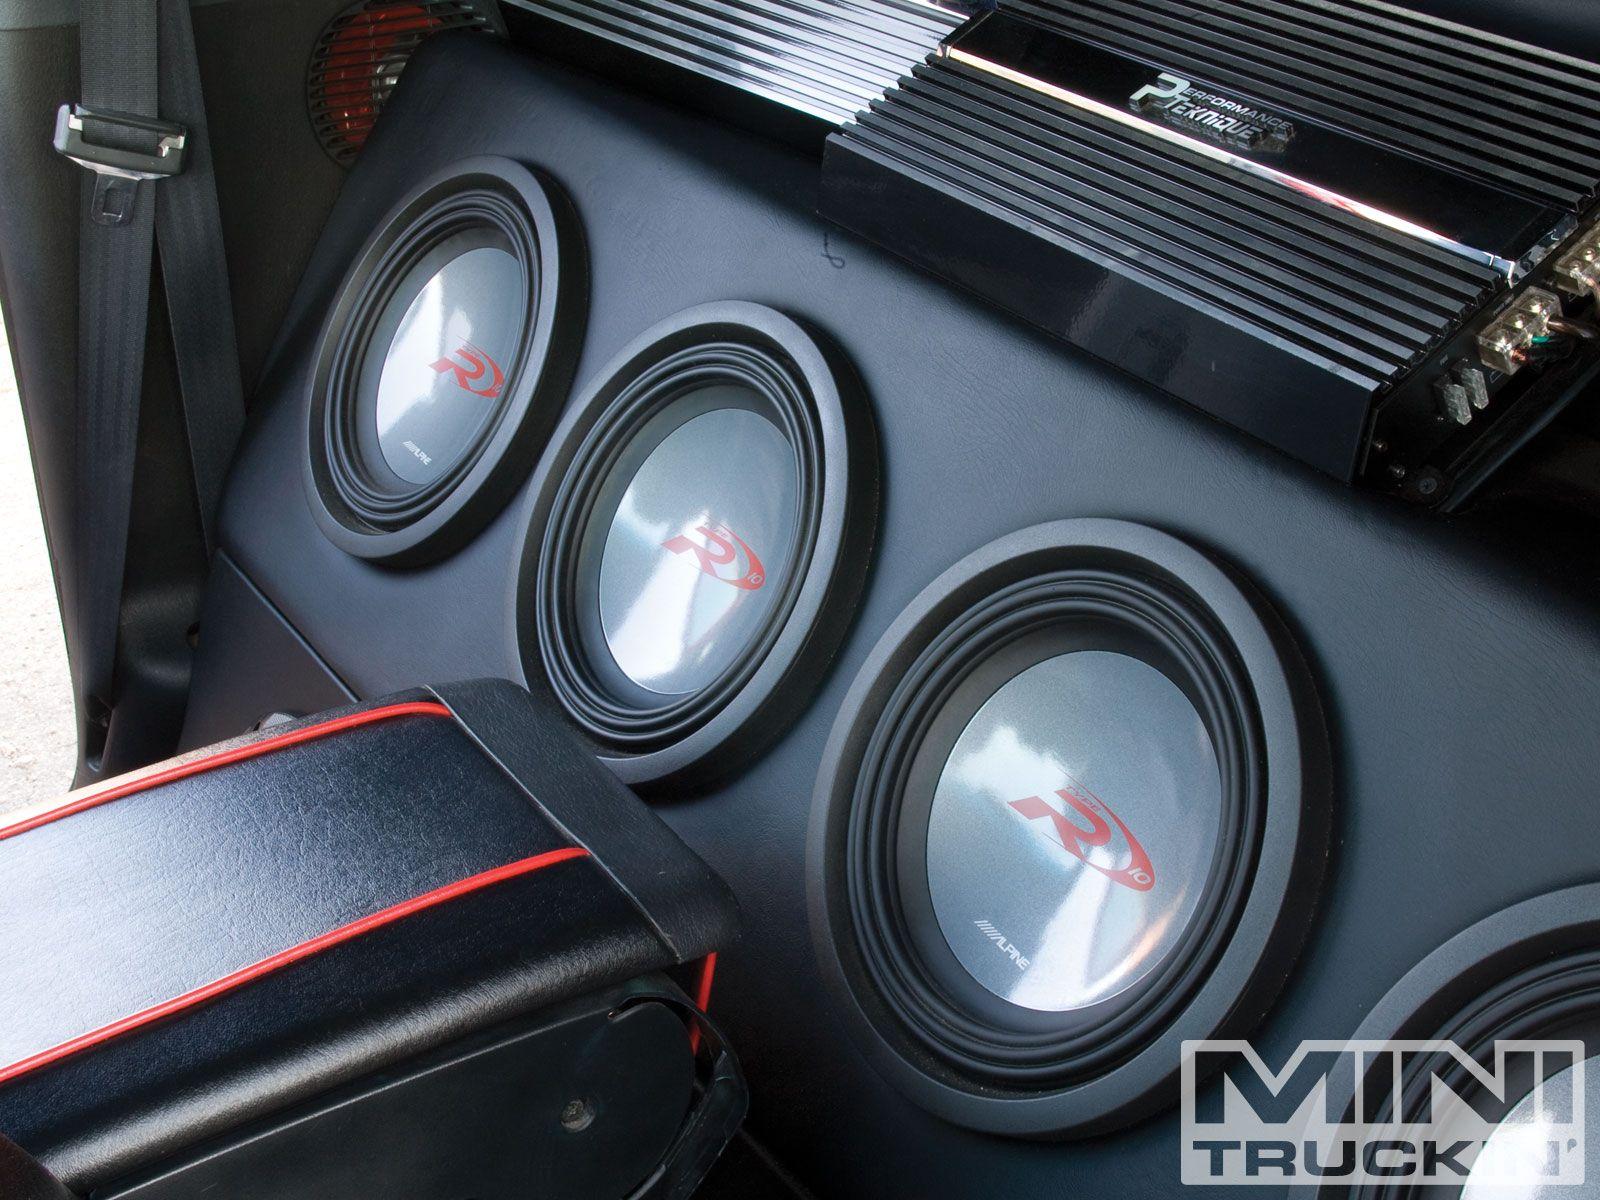 3 12 alpine type rs car audio sound system car car